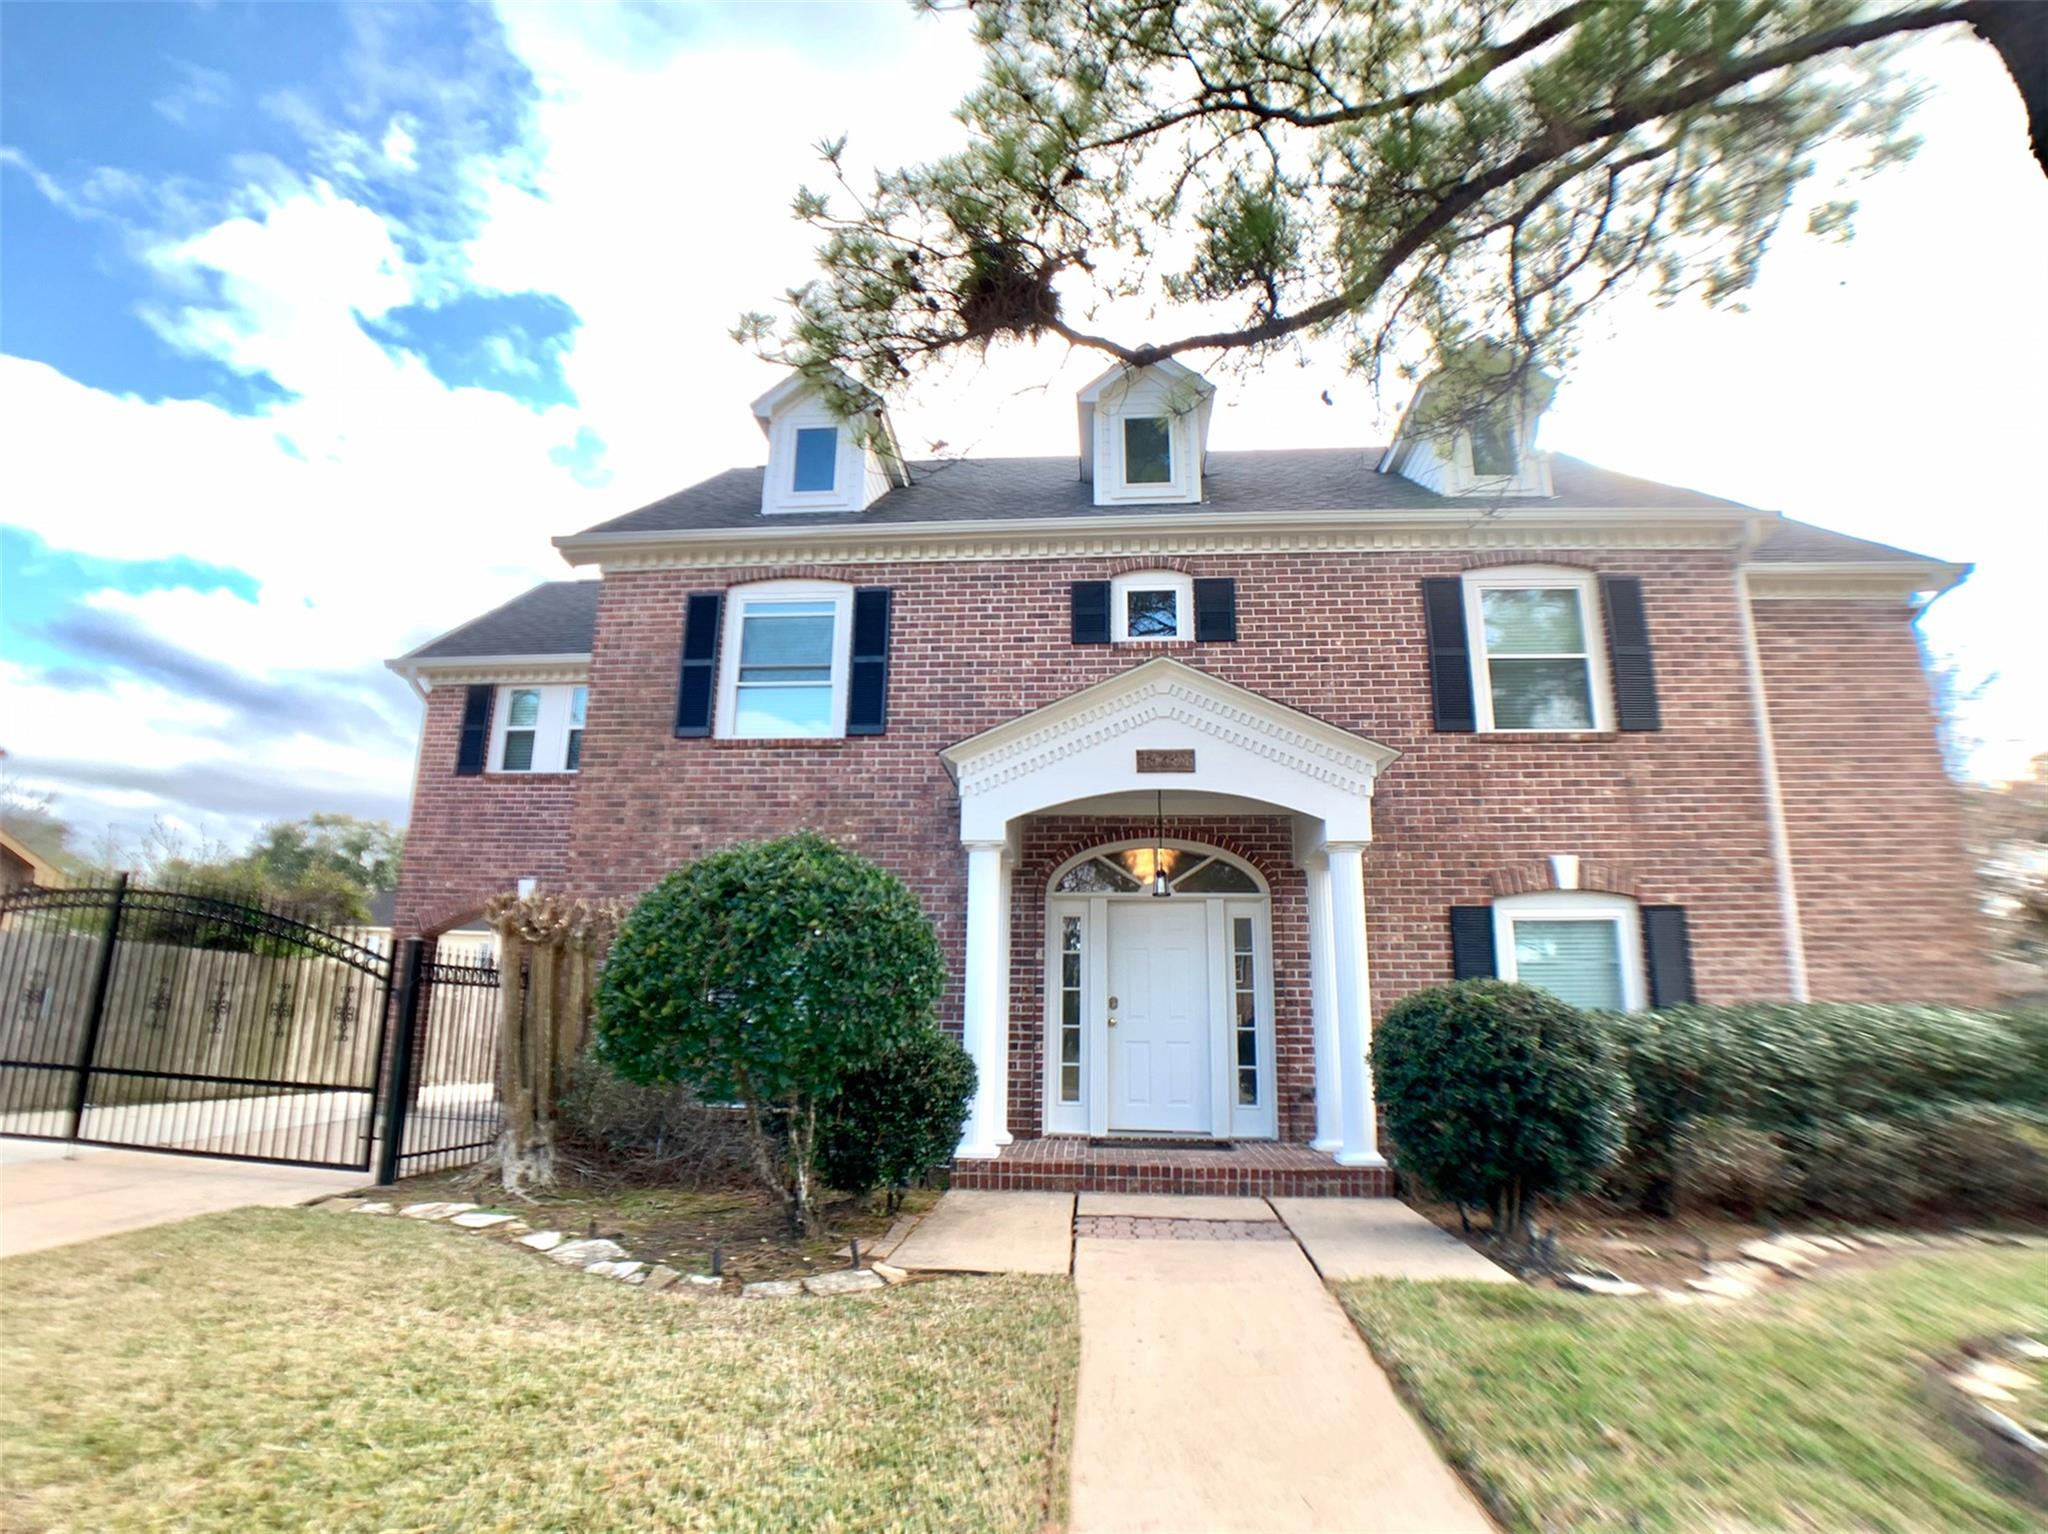 15031 N Rock Knoll Drive Property Photo - Houston, TX real estate listing